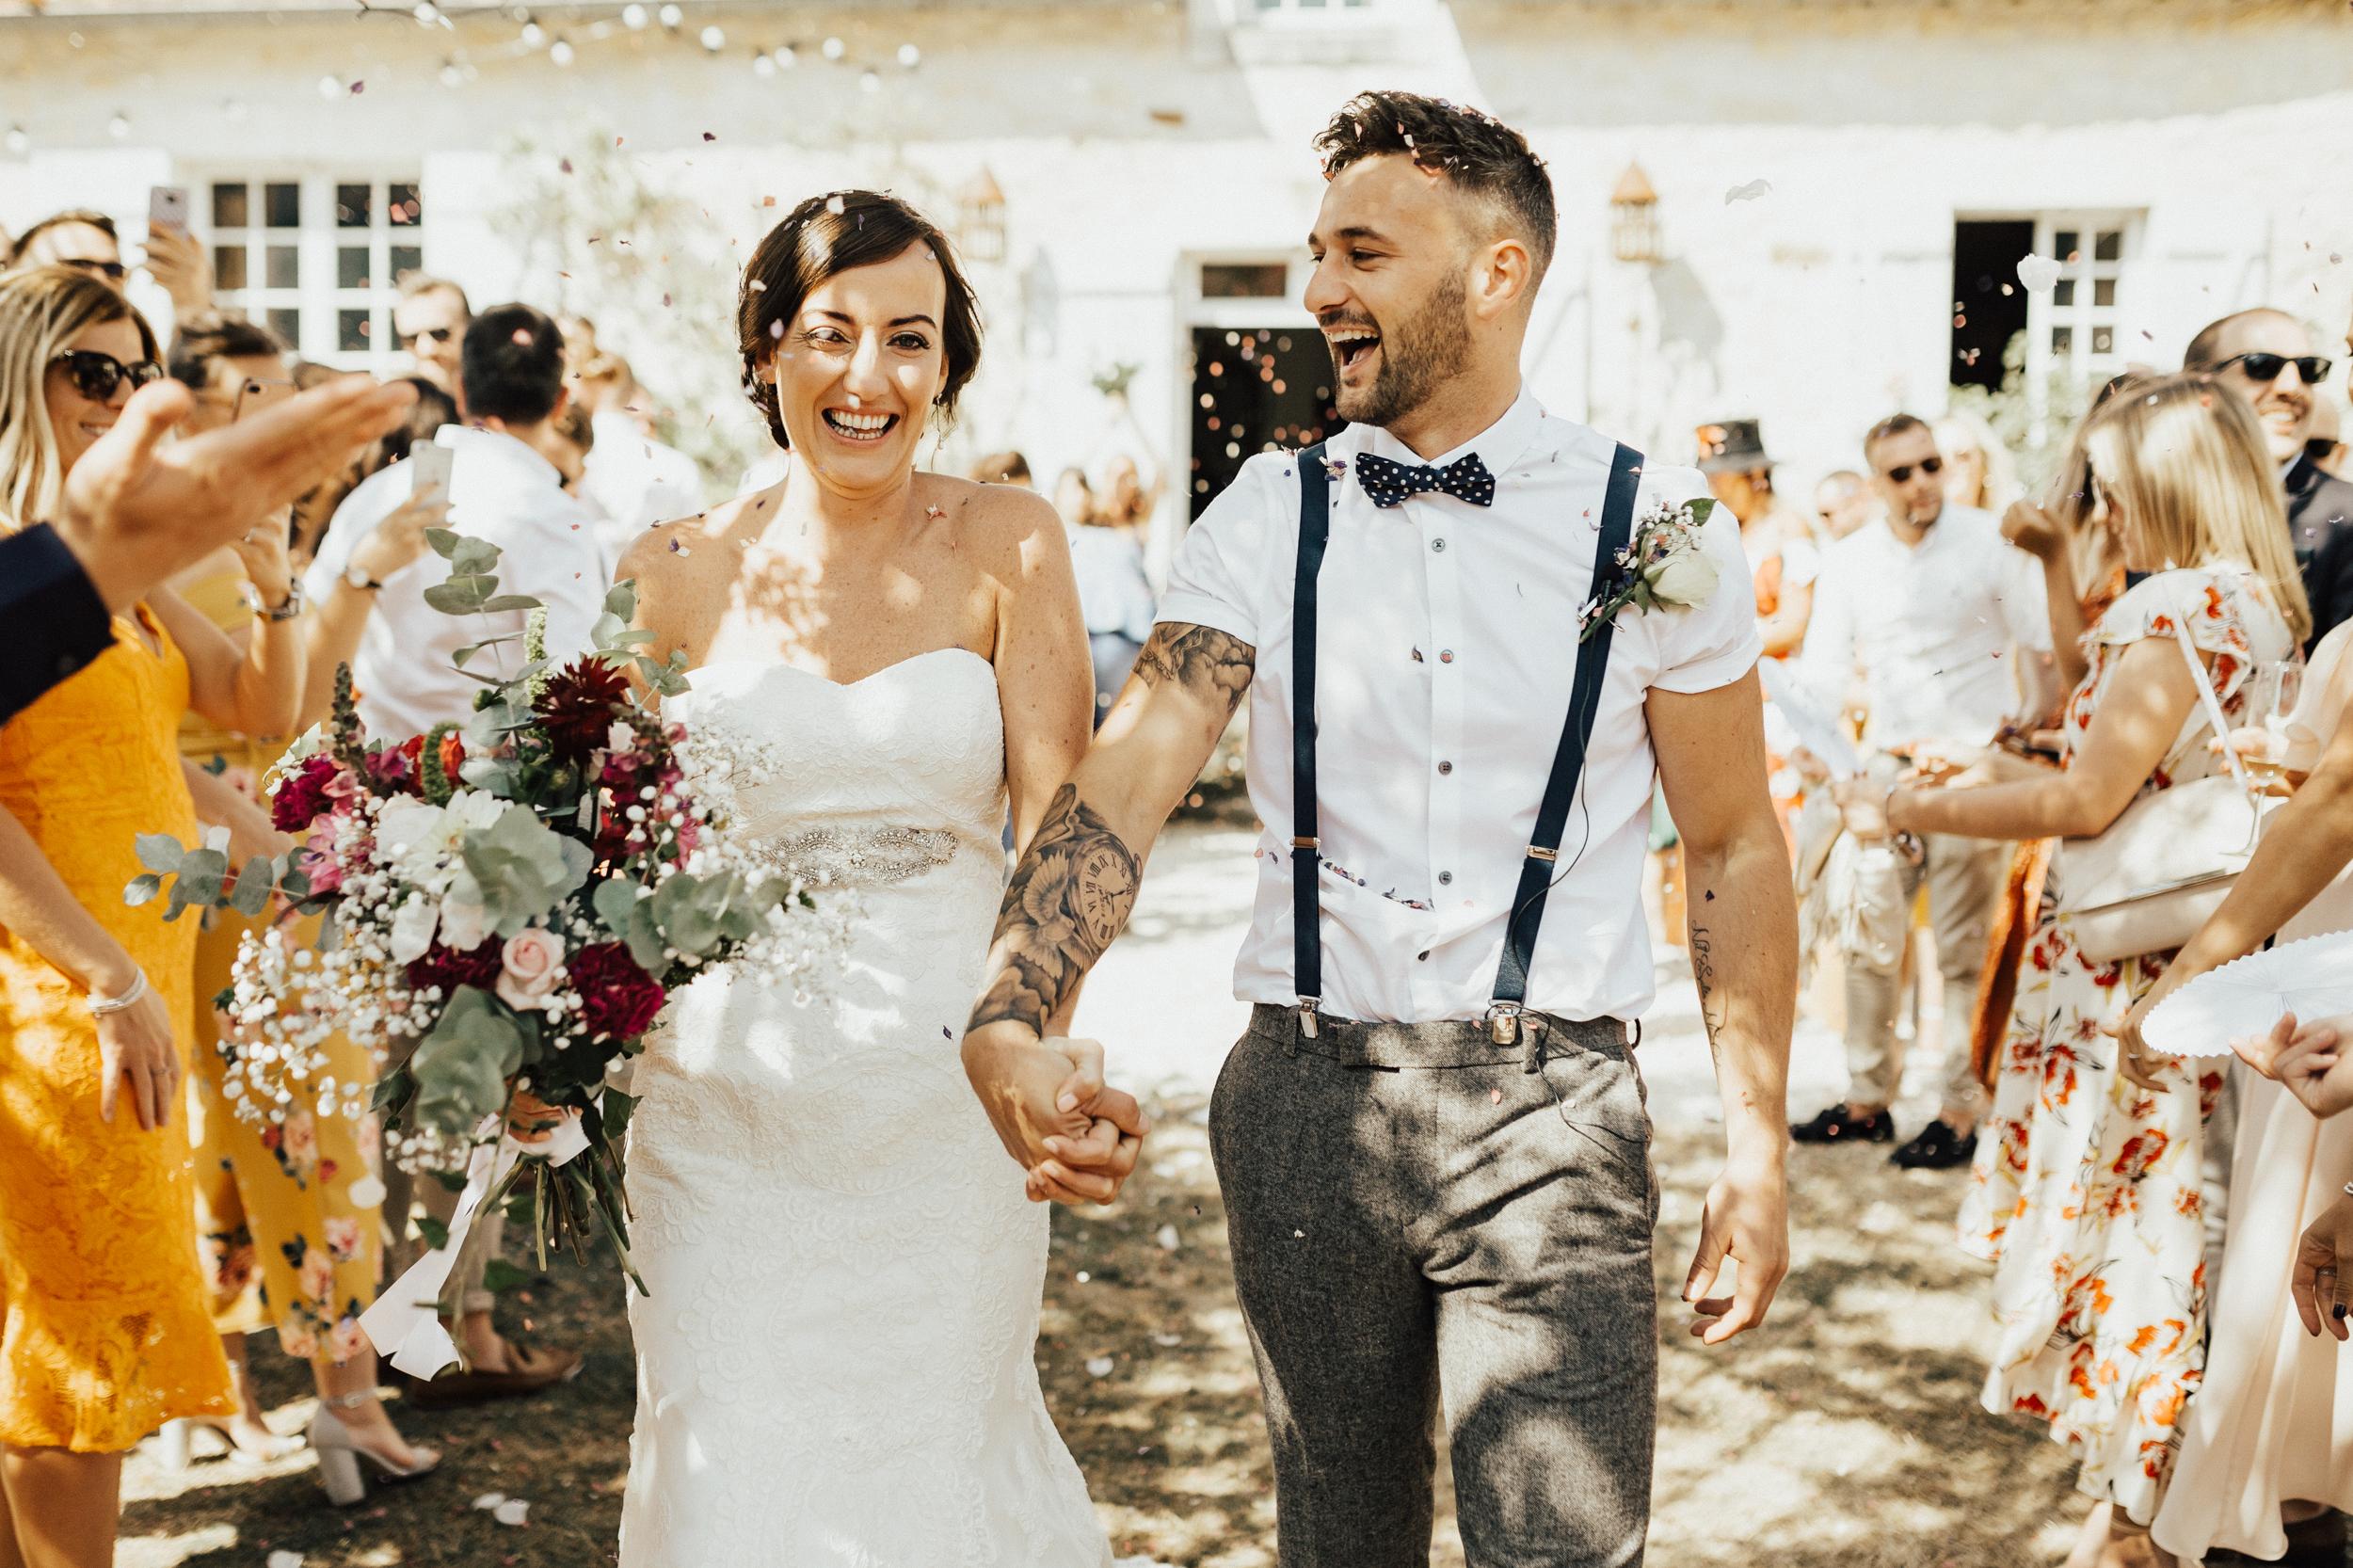 Amy-Zac-Destination-Wedding-France-Manoir-Foulquetiere-Darina-Stoda-Photography-51.jpg